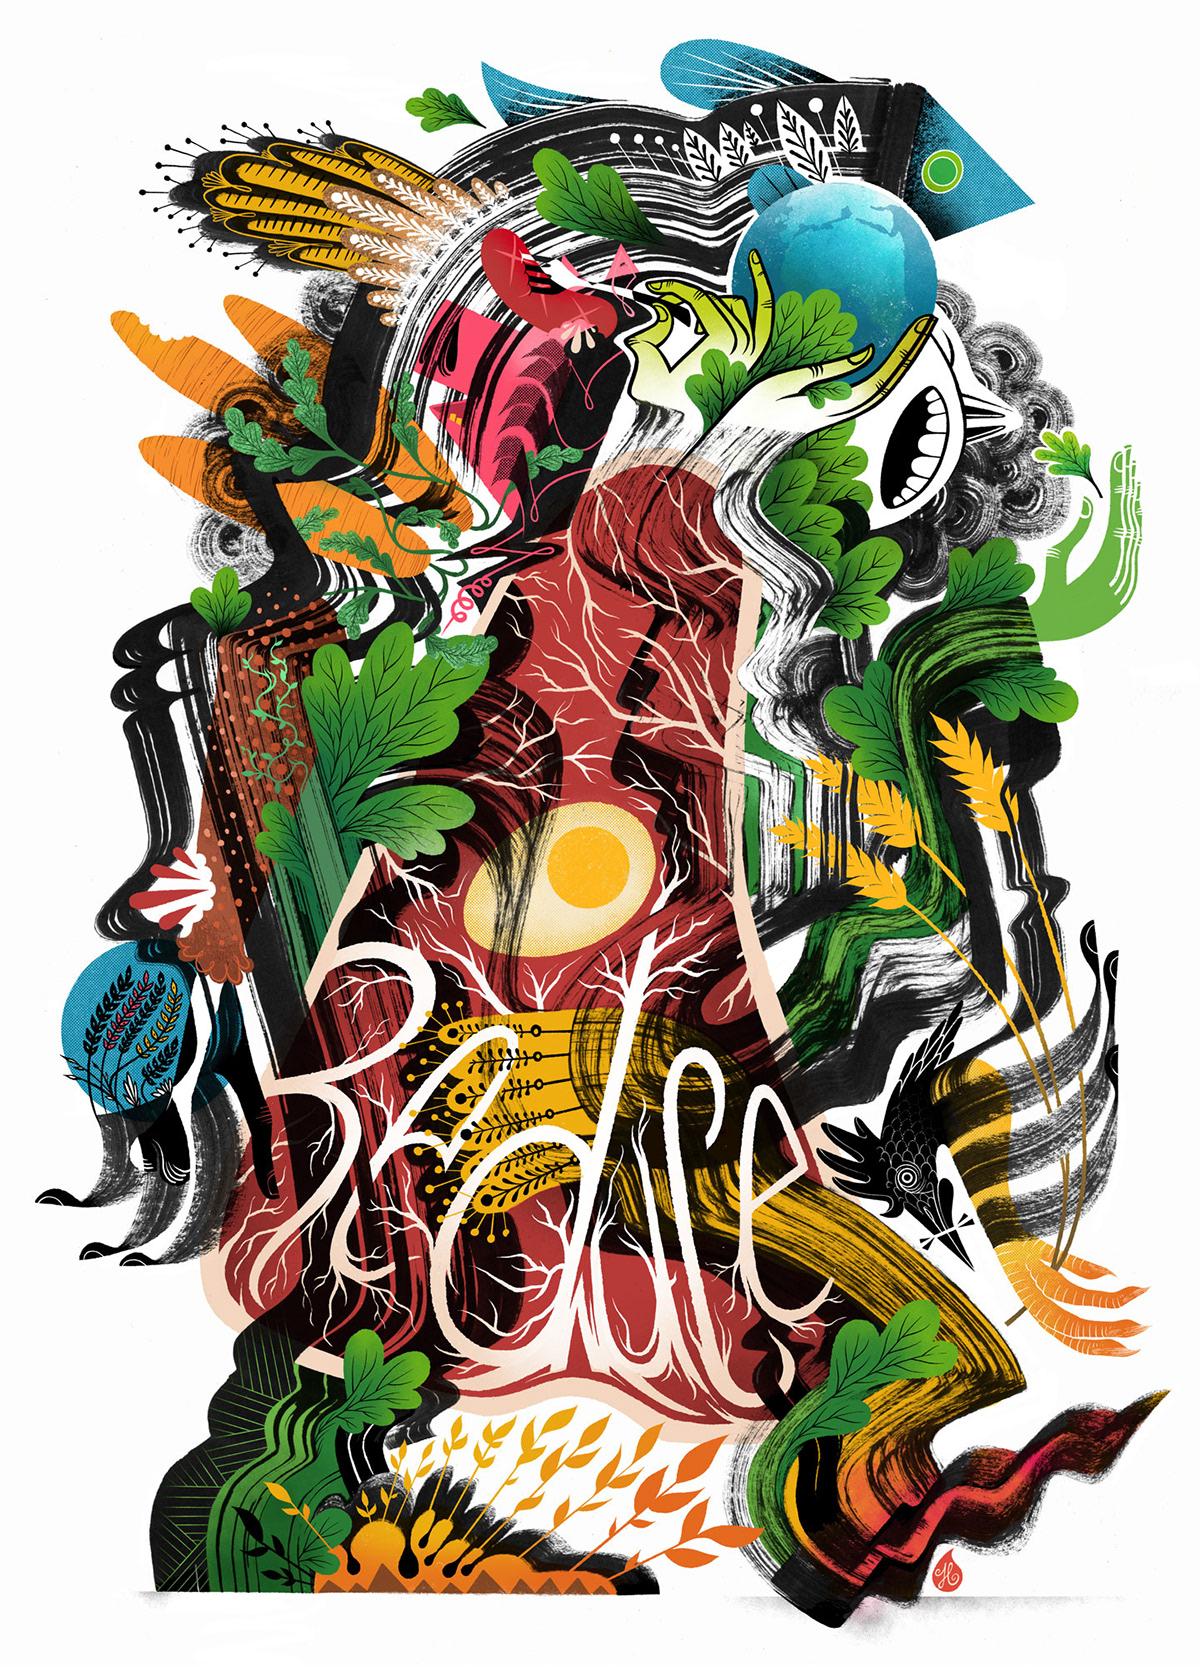 abstractart,book cover,contemporary,diet,digitalart,Health,ILLUSTRATION ,ink,nutrition,poster